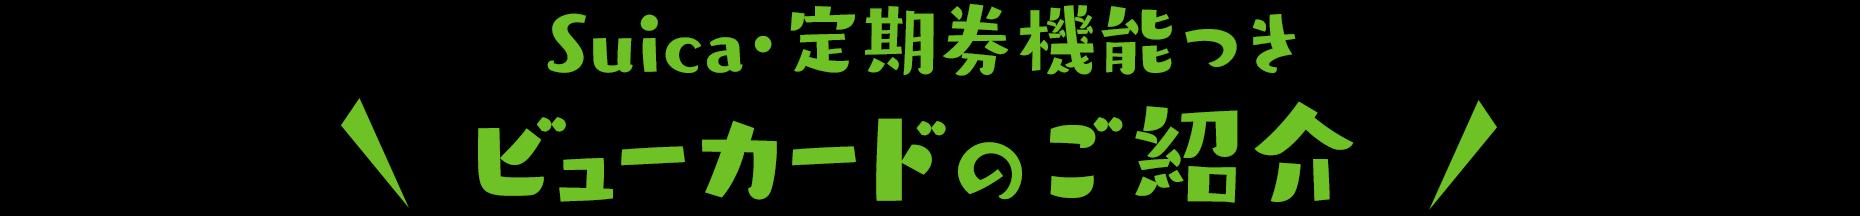 Suica・定期券機能つきビューカードのご紹介